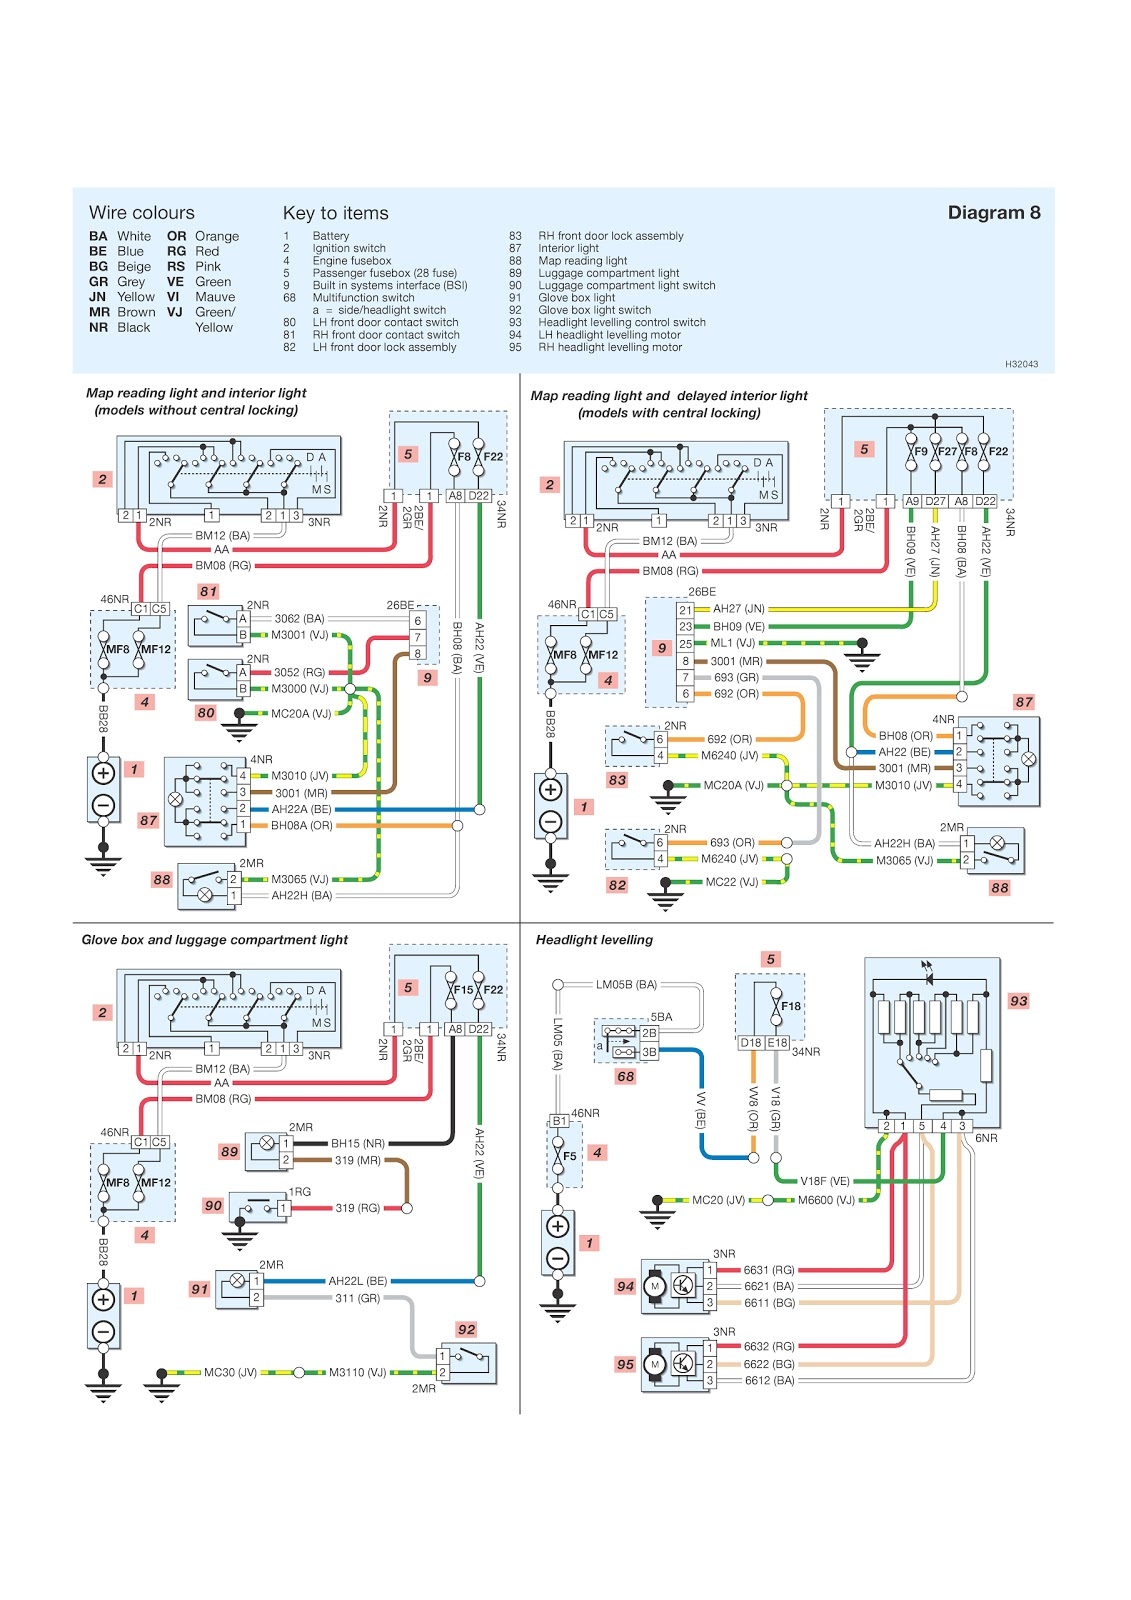 Peugeot 206 Cc Central Locking Wiring Diagram 307 306 Light Diagramrh